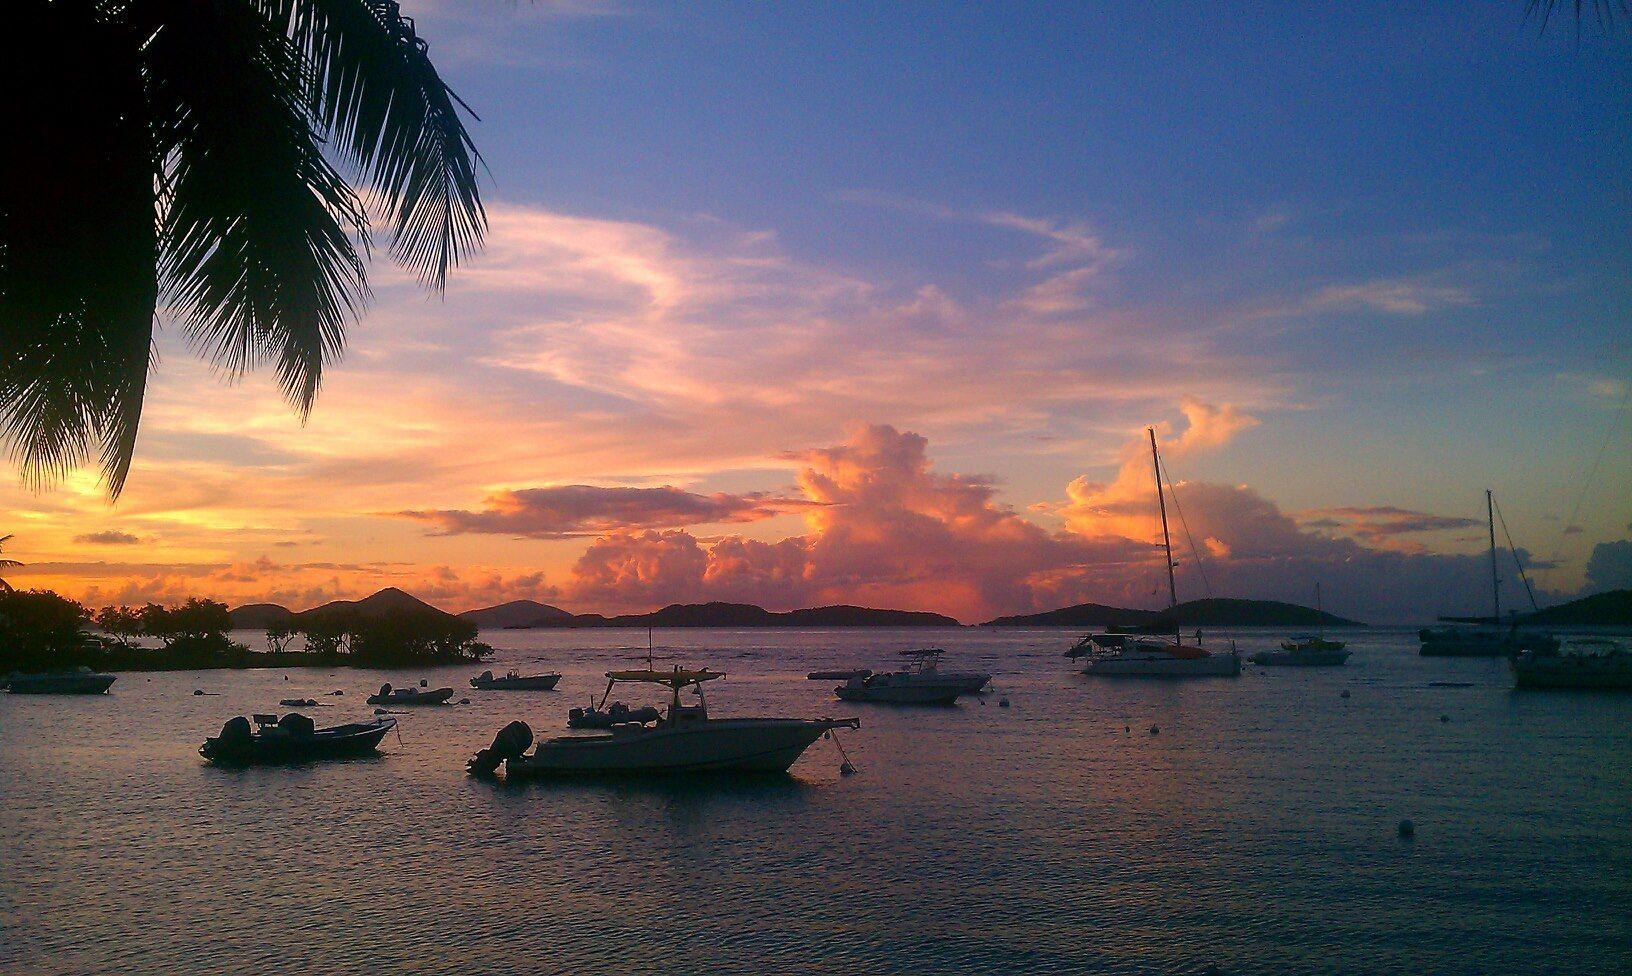 View from Cruz Bay 8/29/12 - St. John, USVI (Caribbean, Virgin Islands)